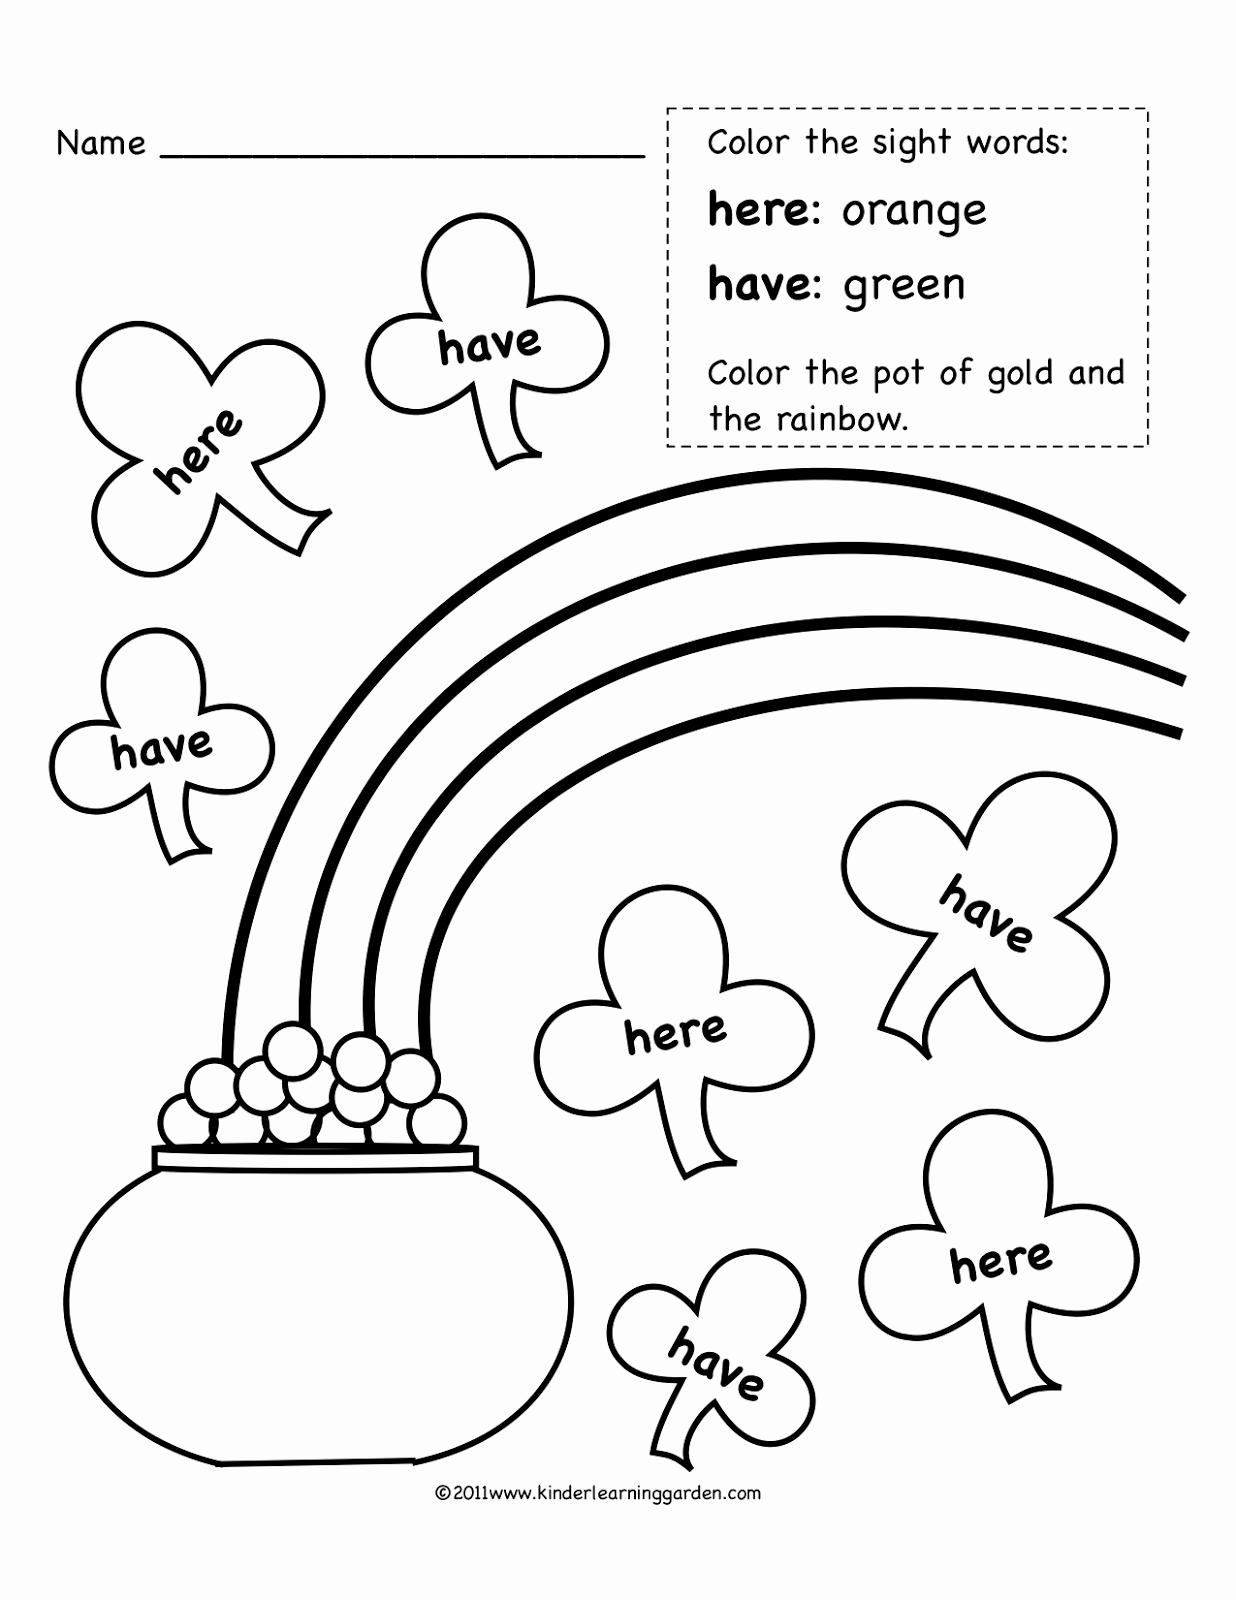 Kindergarten Sight Word Coloring Worksheets New Kinder Learning Garden March Sight Words Freebie